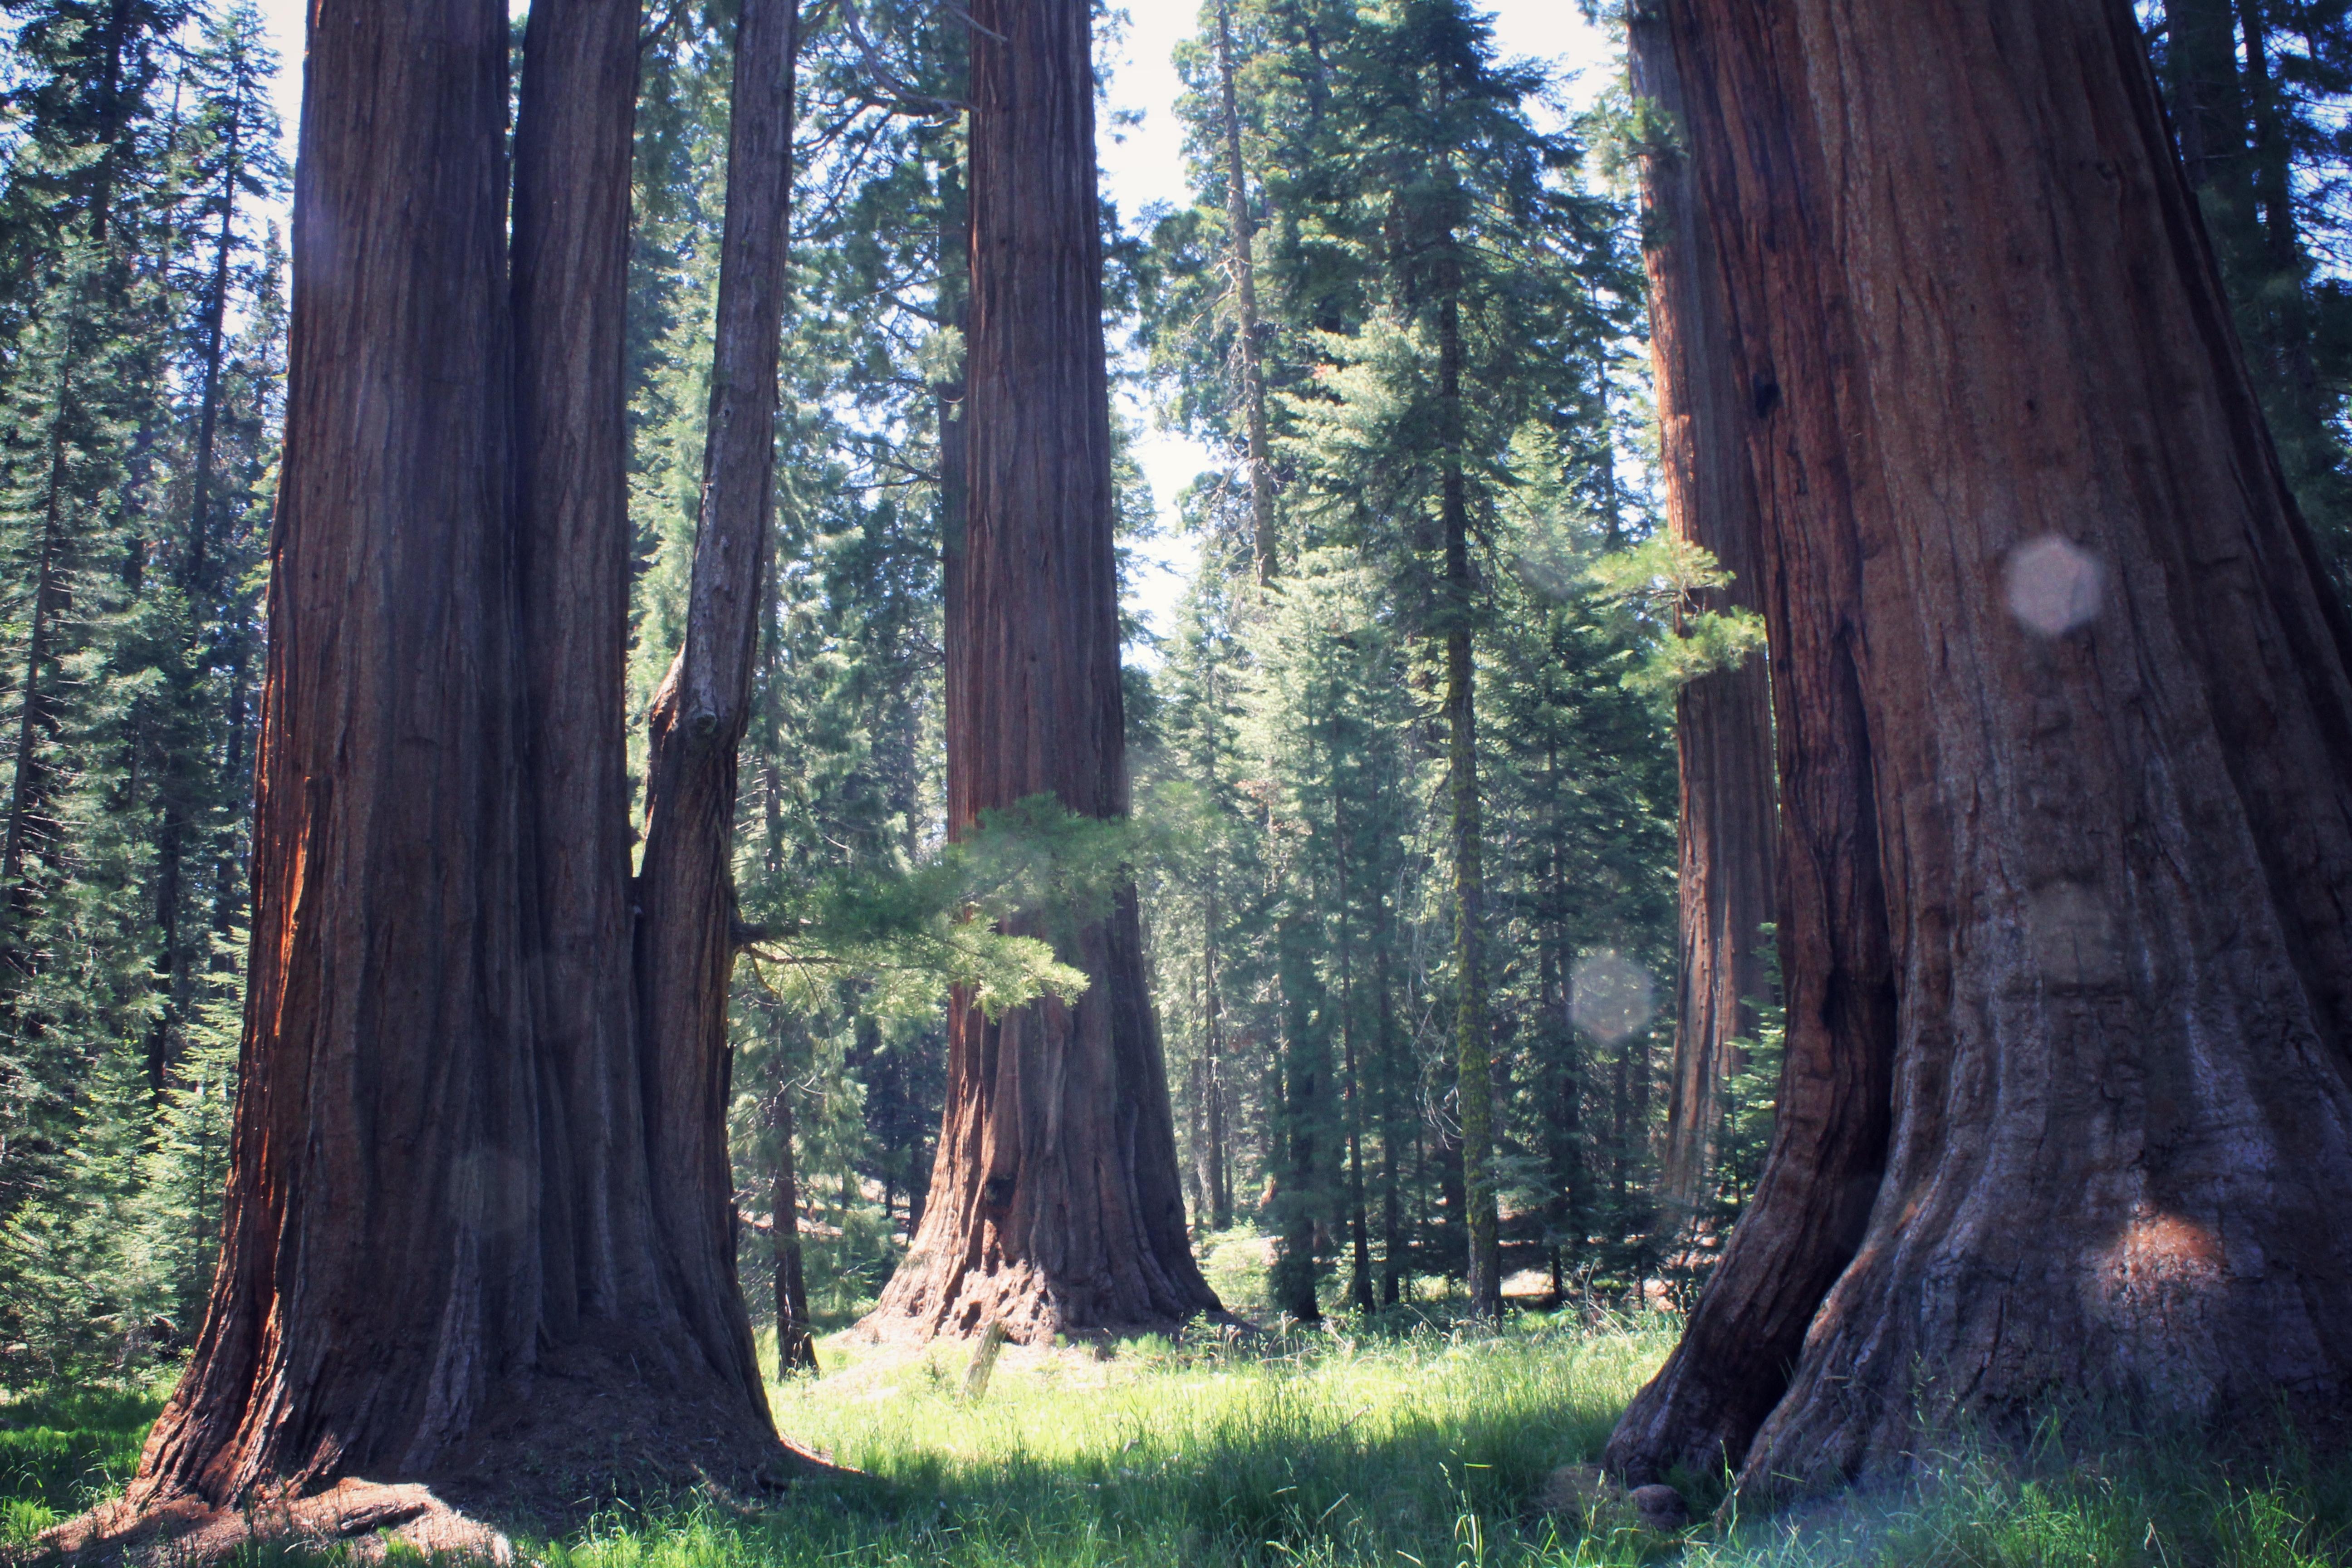 Sequoia Grove in Sequoia National Park